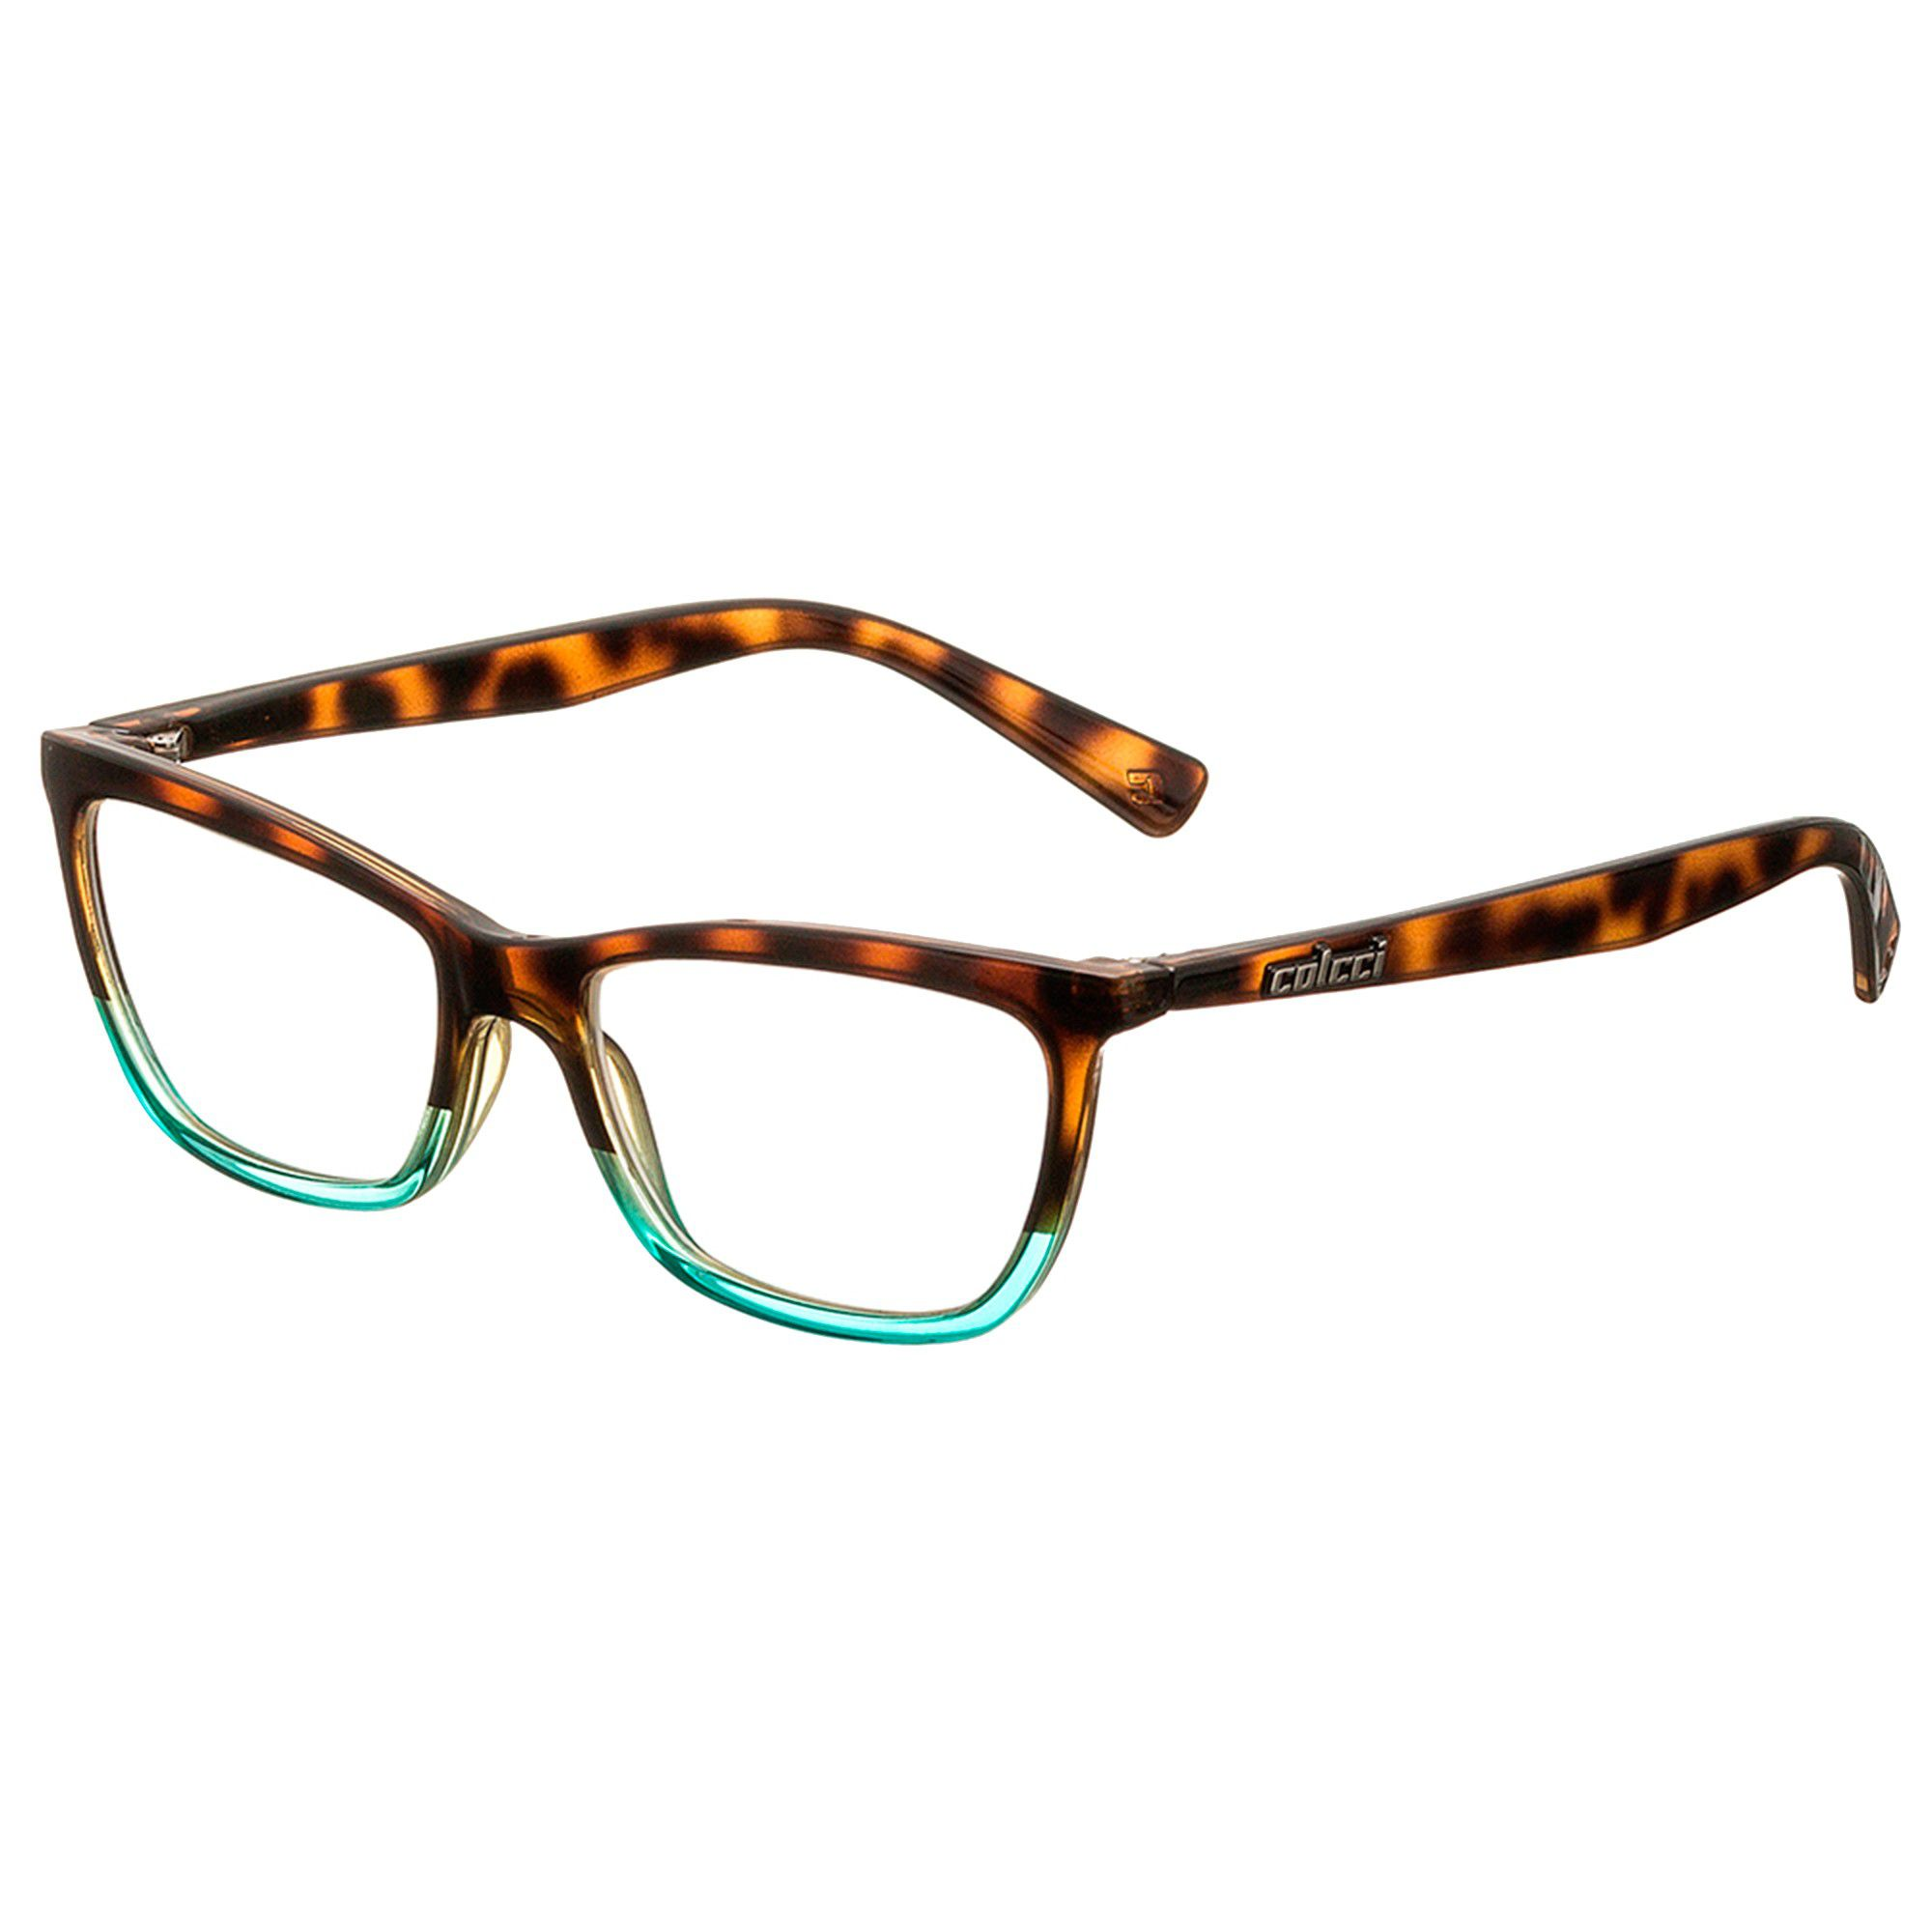 Óculos de Grau Feminino Colcci Scarlett C6039F5652